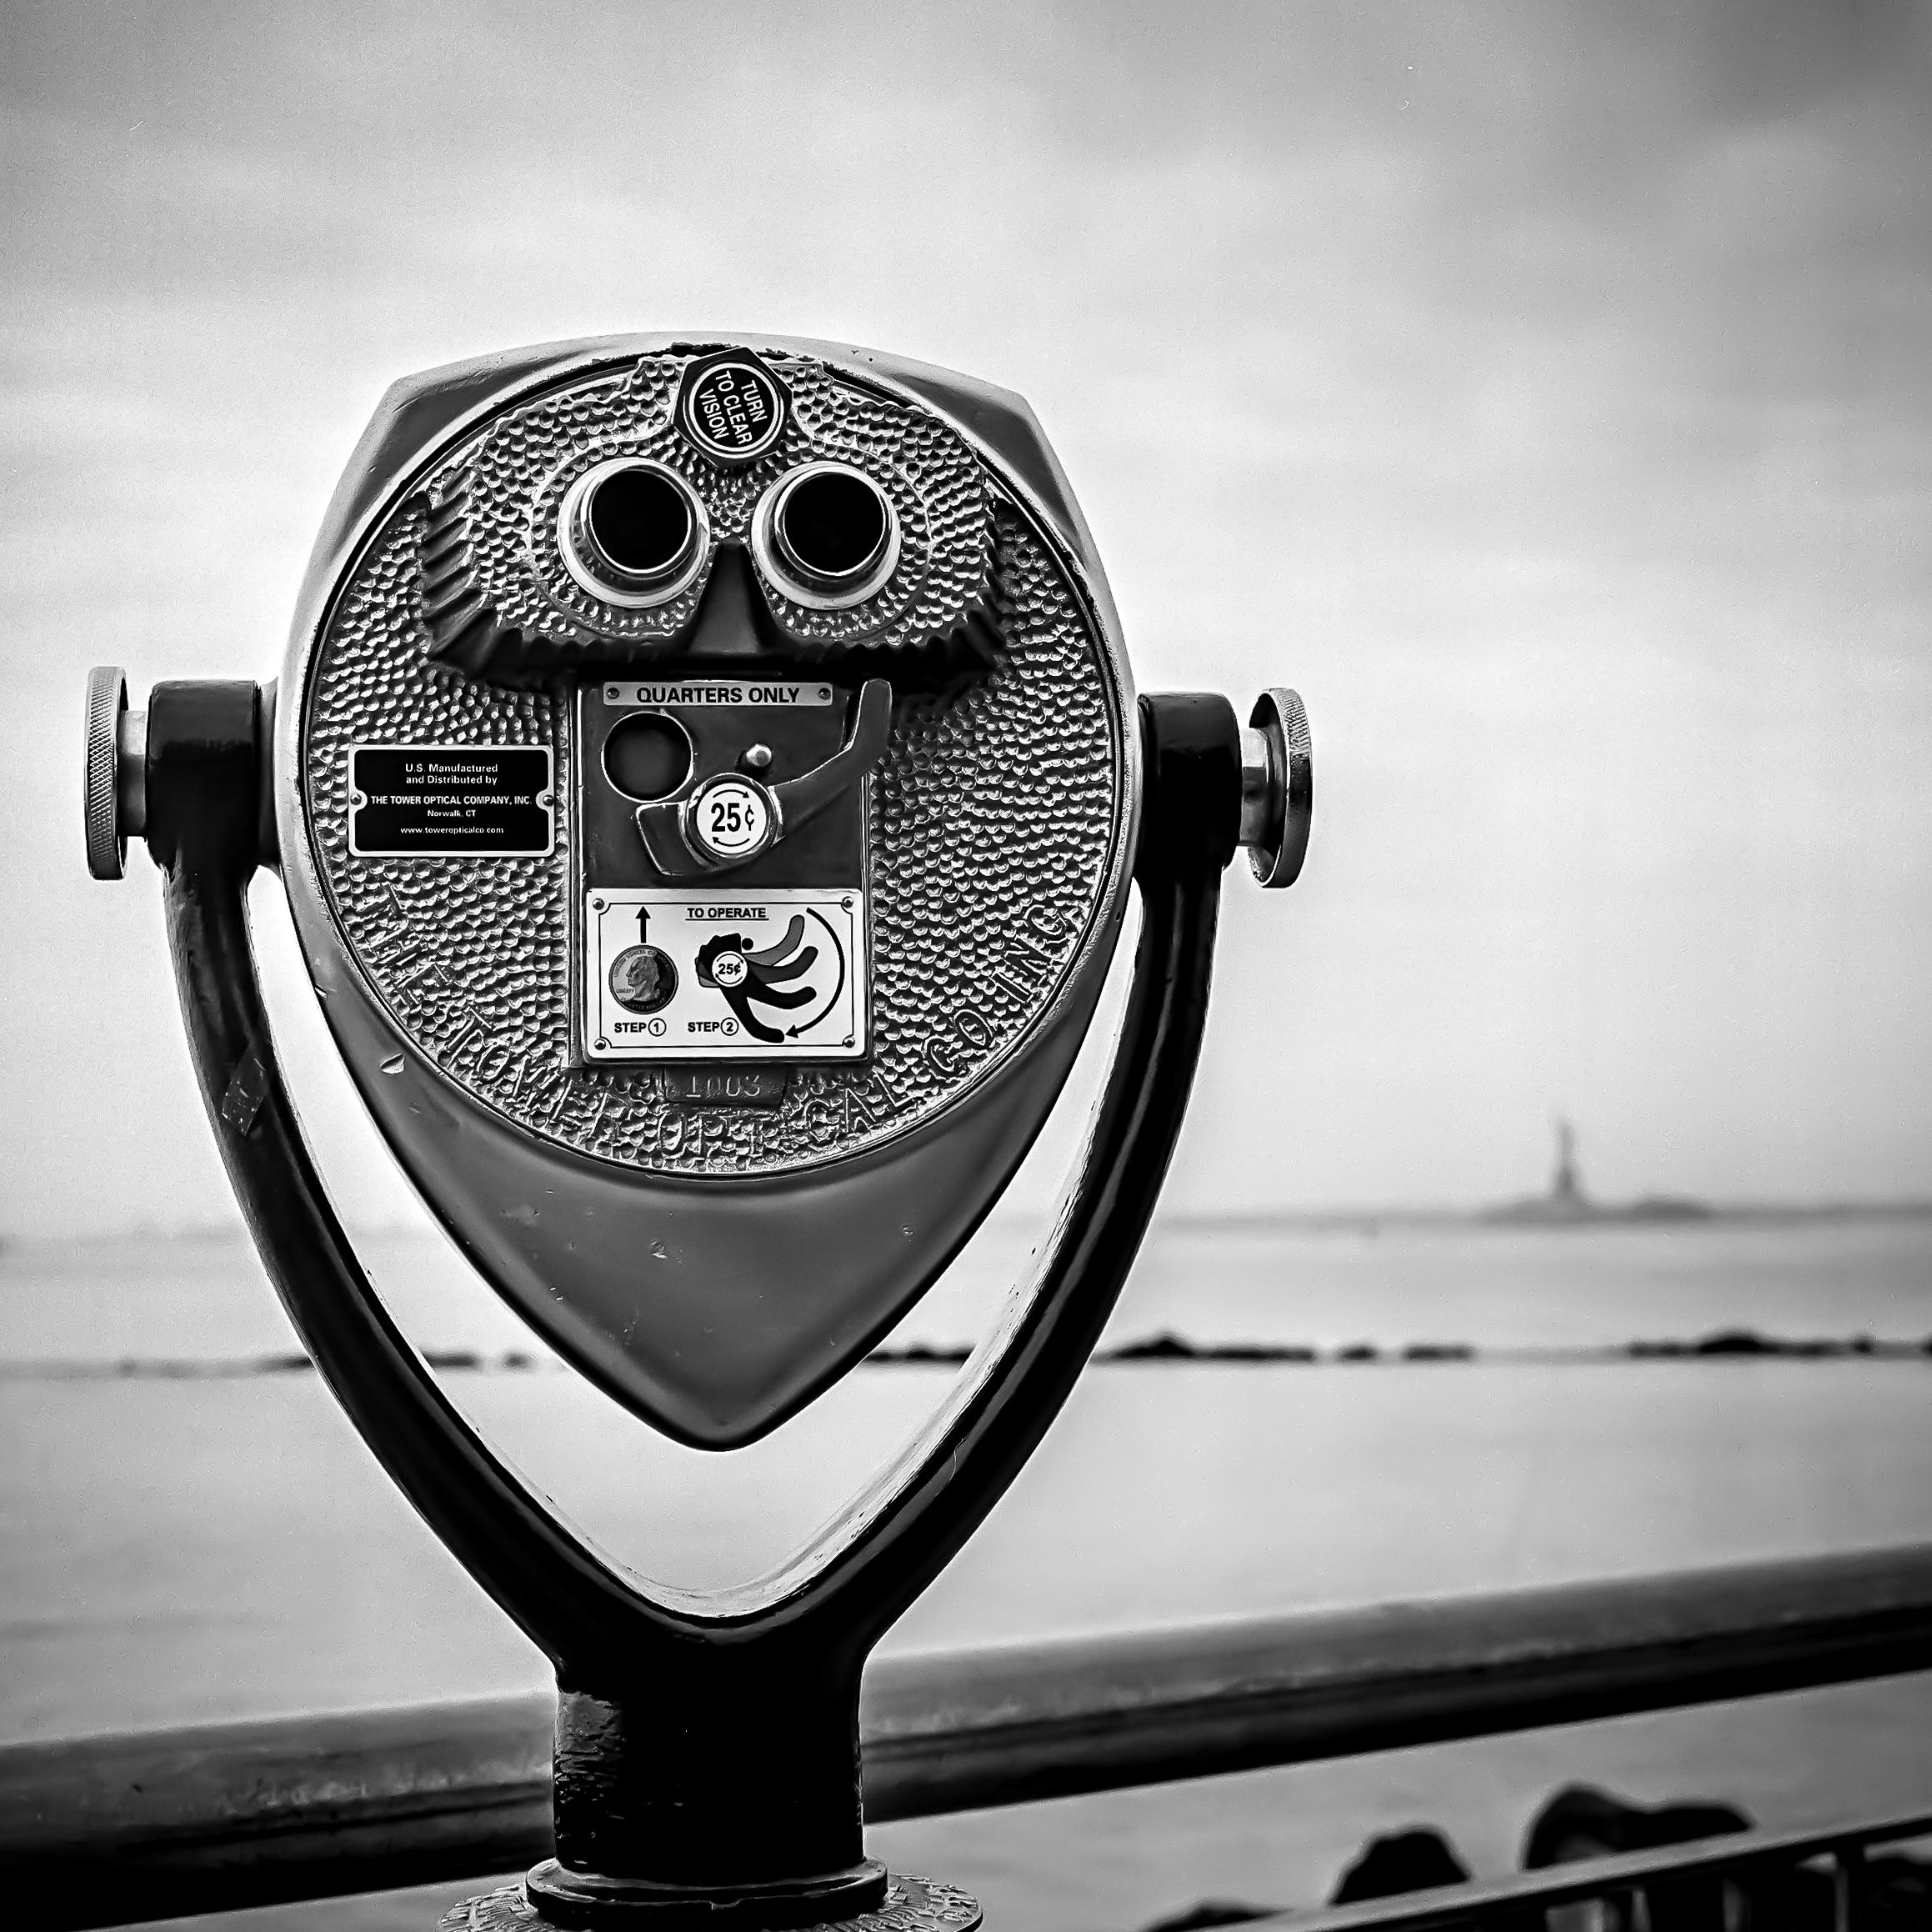 Liberty - NYC 2014 - Hasselblad 500c Tri-X 400